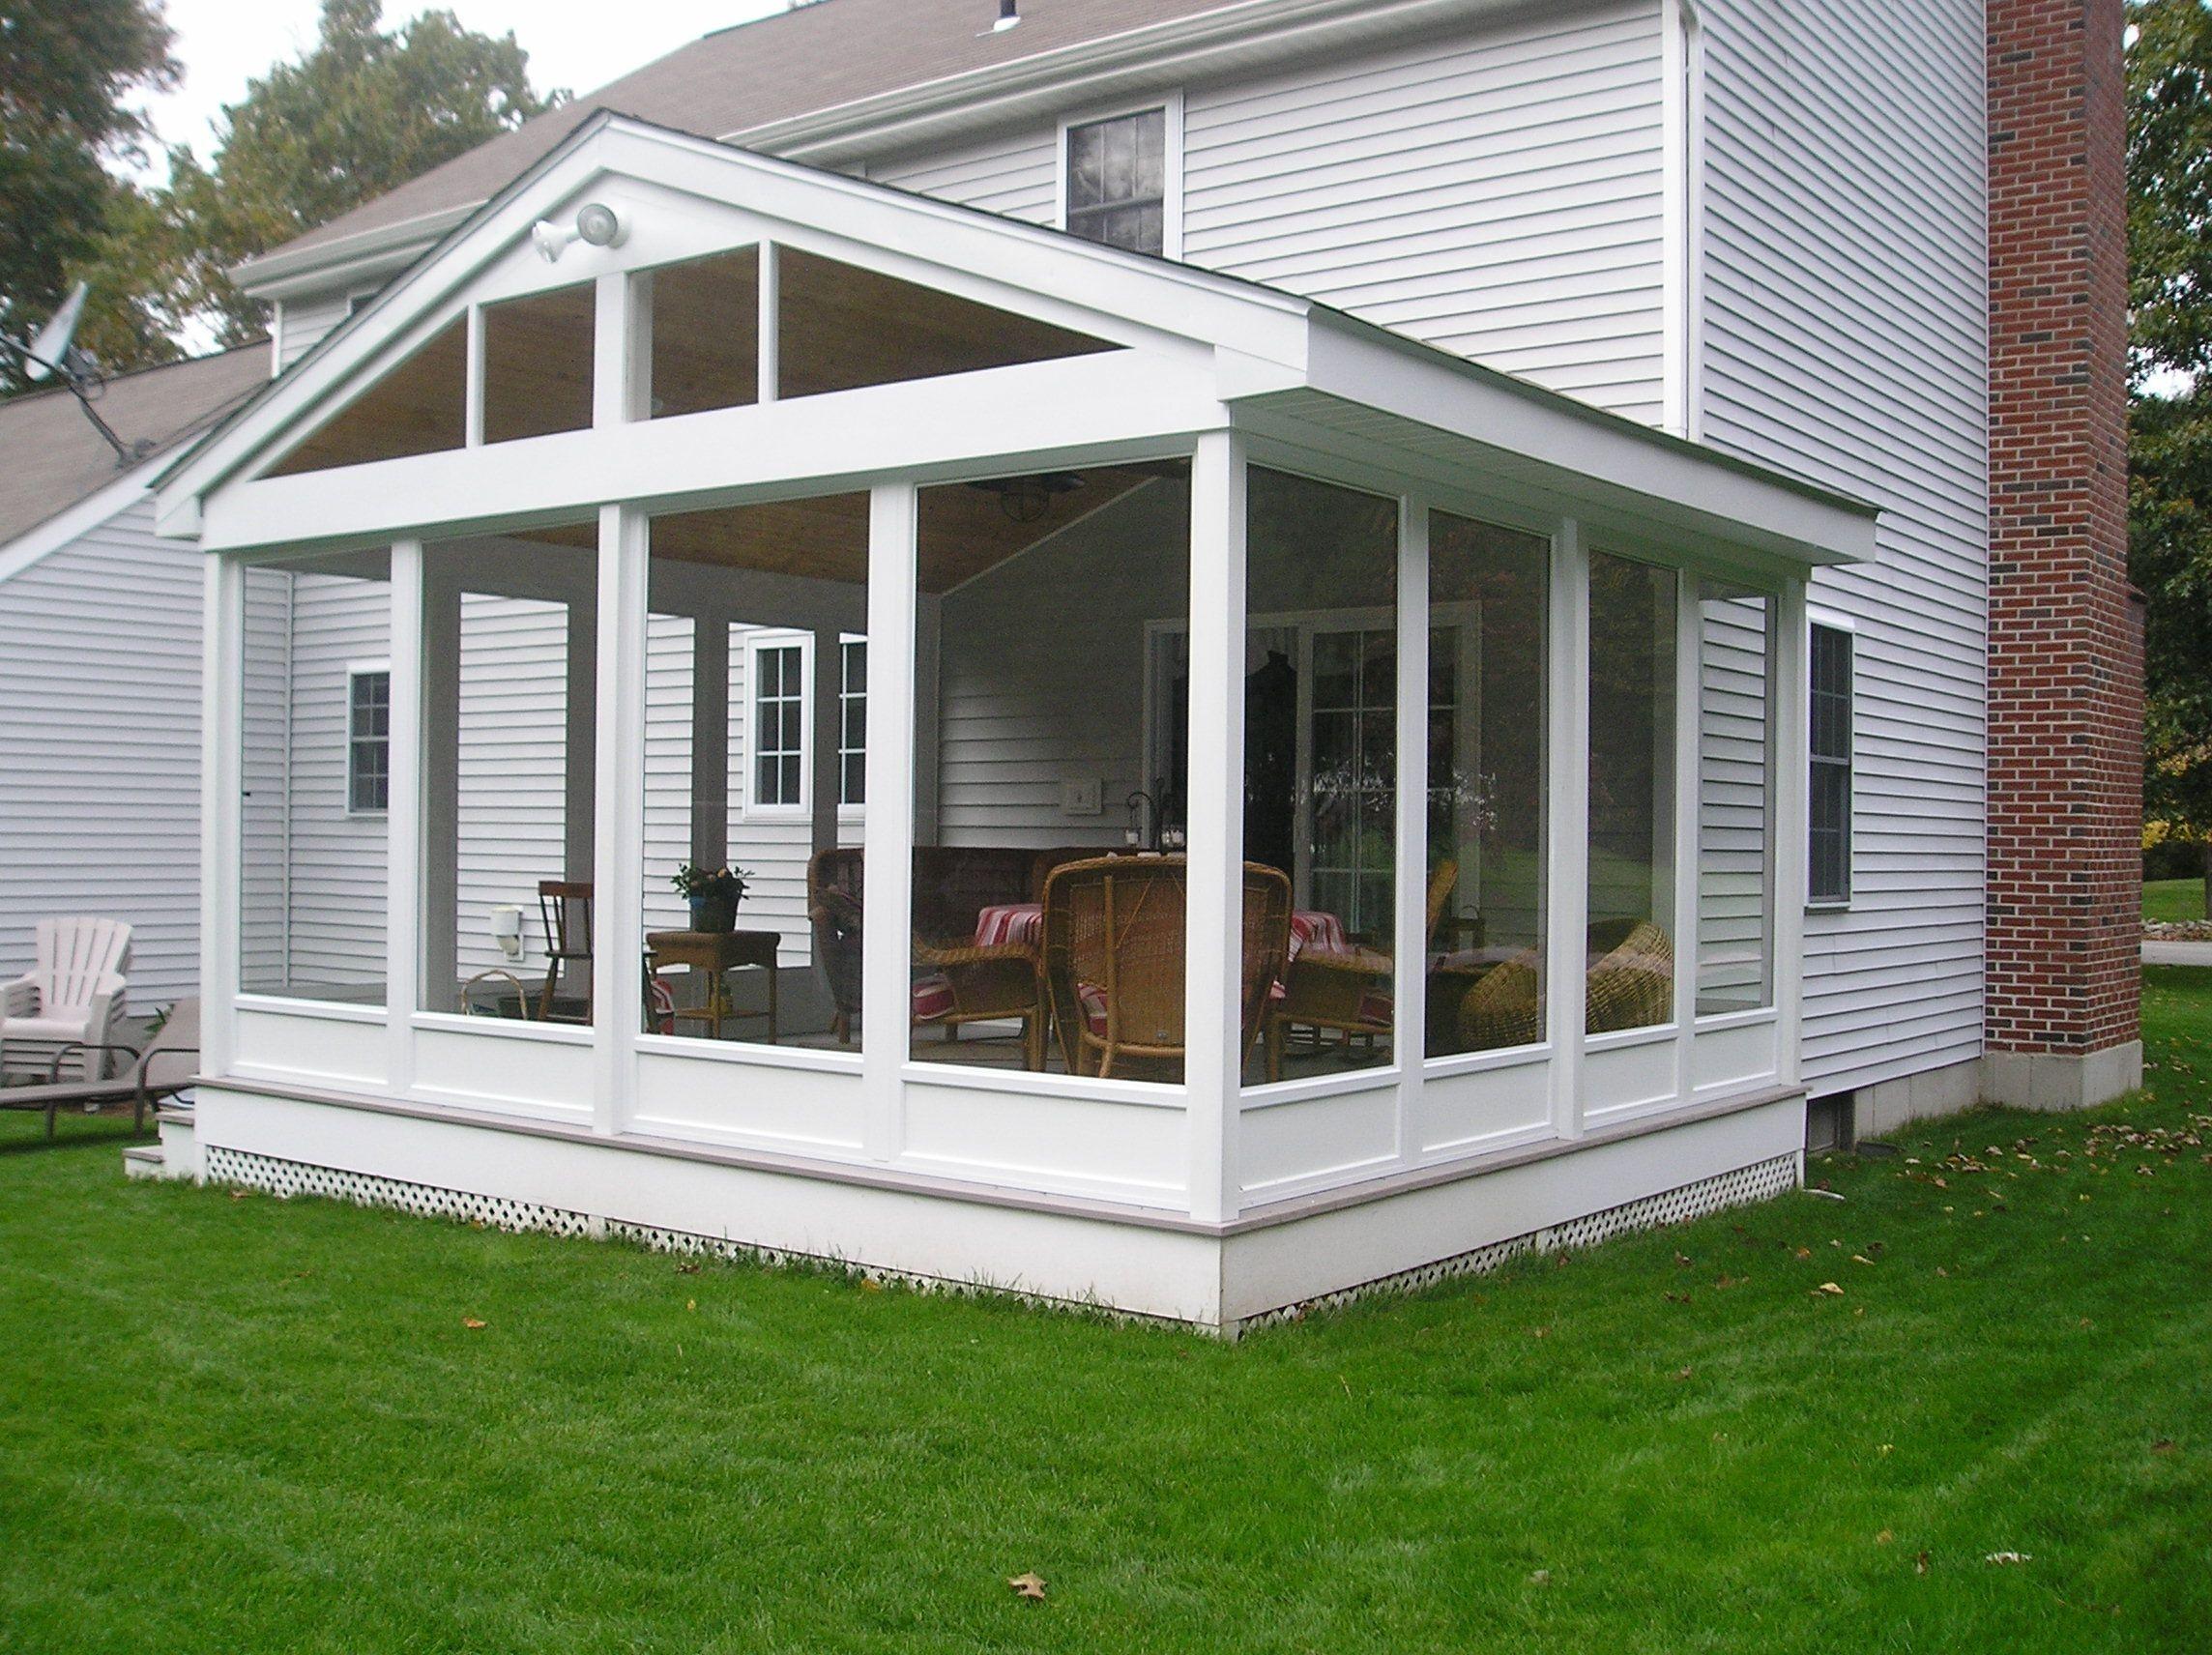 Elegant Screen Porch Enclosure Systems Ds043w Porch Design Screened Porch Designs Screen Porch Systems